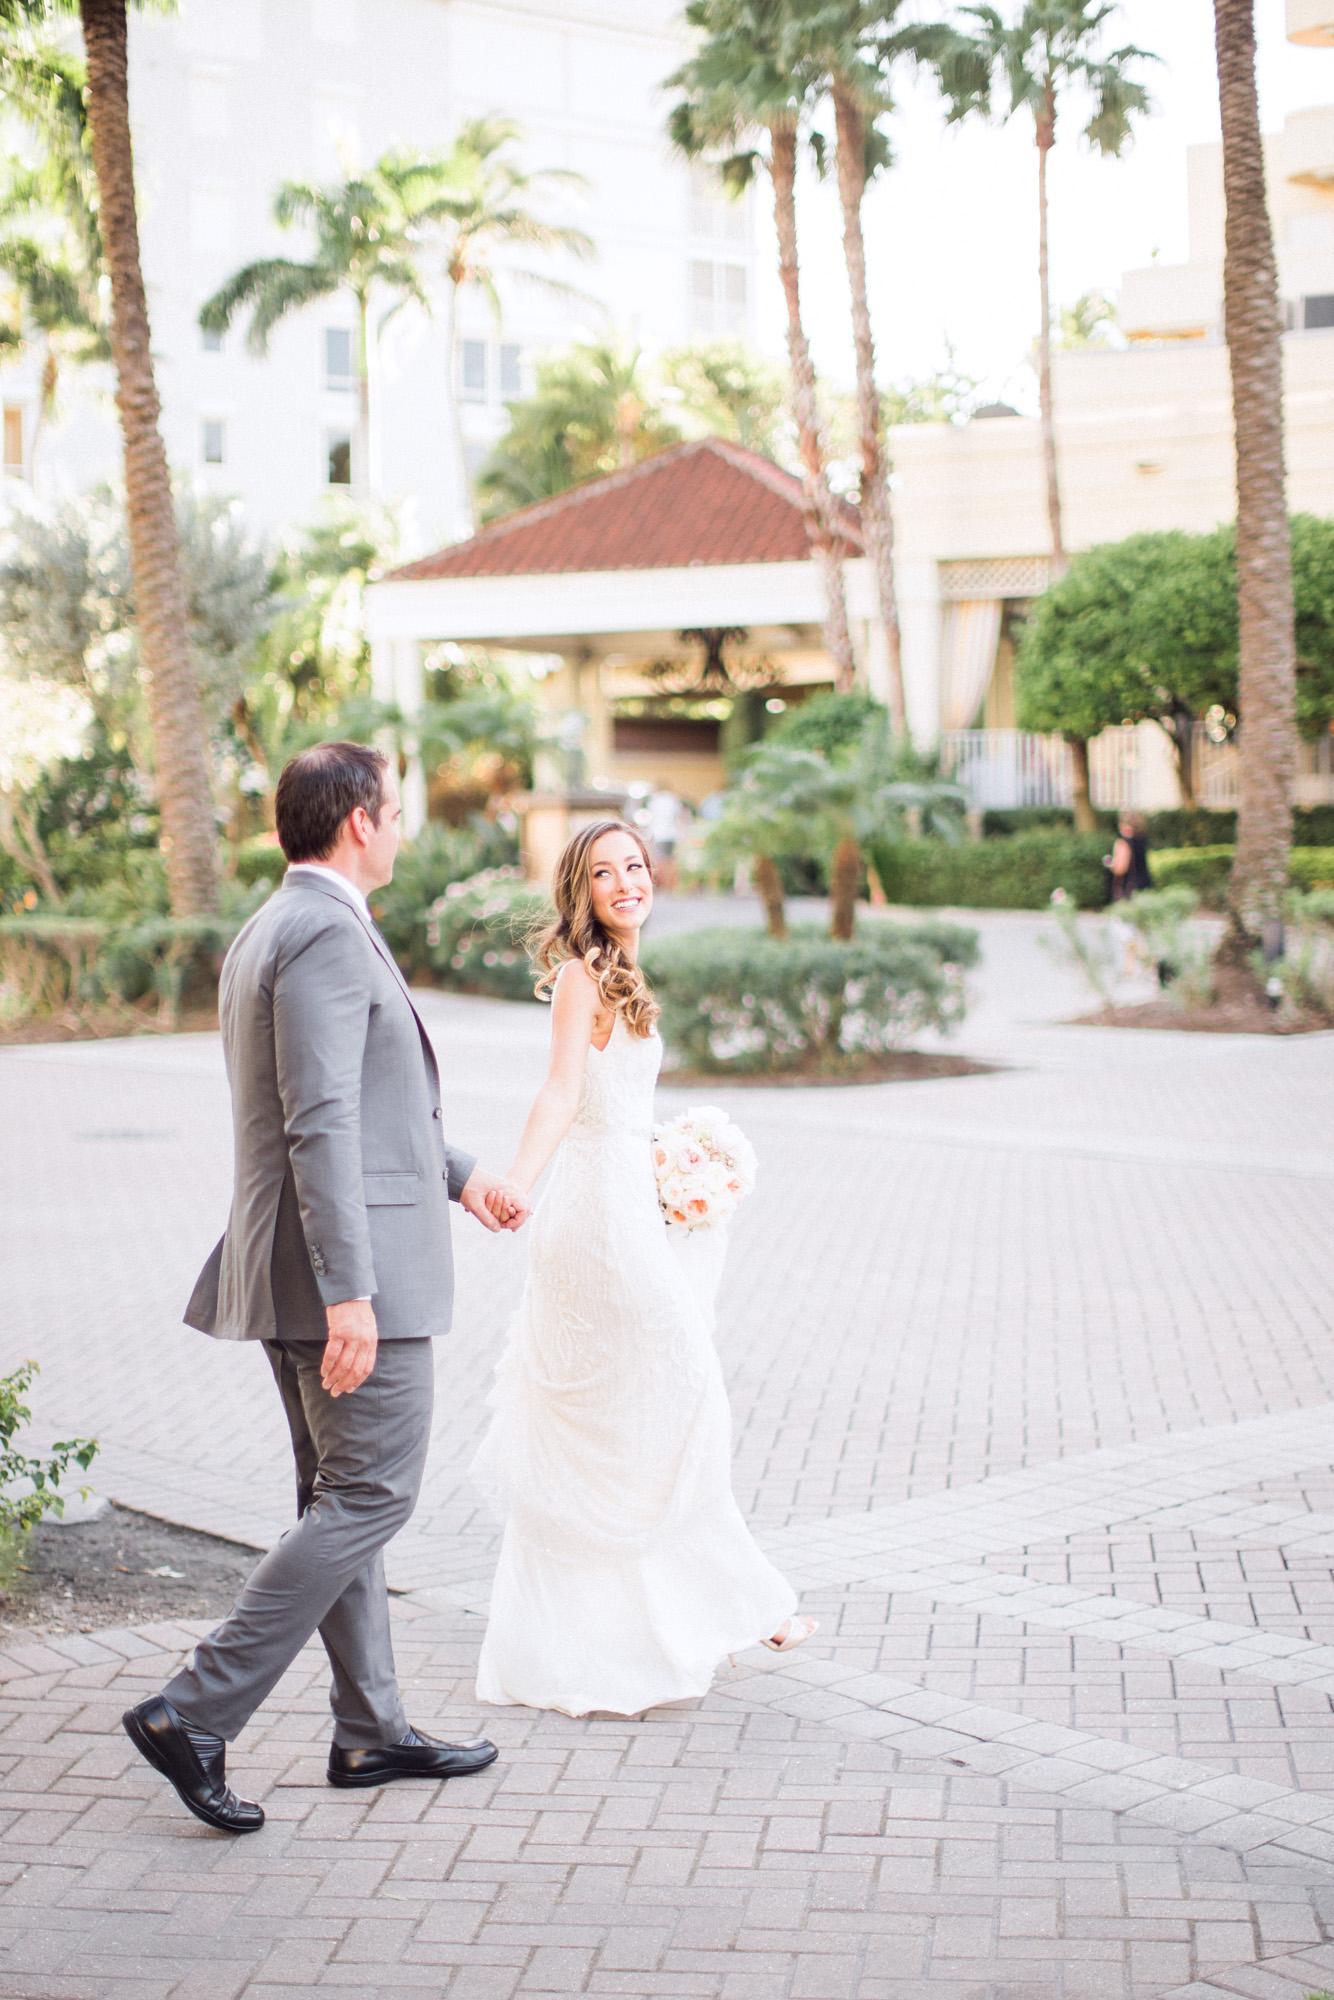 la-playa-naples-florida-destination-wedding-photographer-justine-steve-00200.jpg